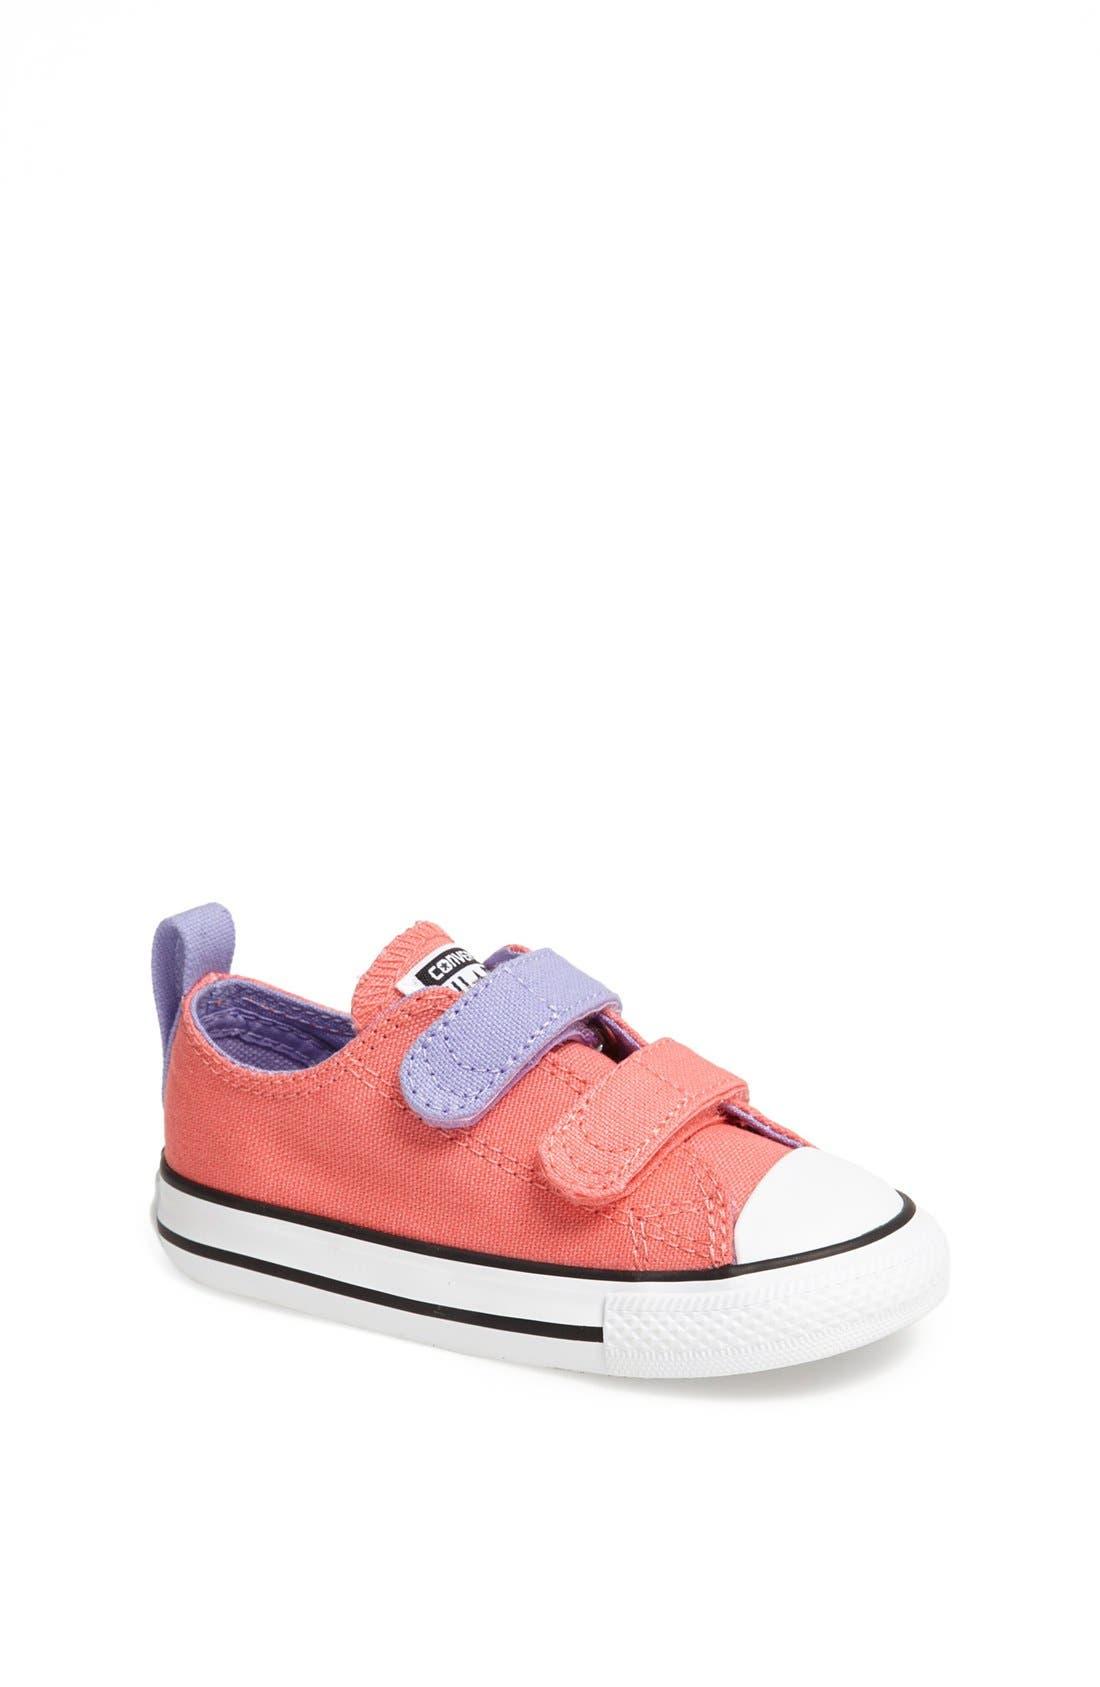 Main Image - Converse Chuck Taylor® All Star® '2V' Sneaker (Baby, Walker & Toddler)